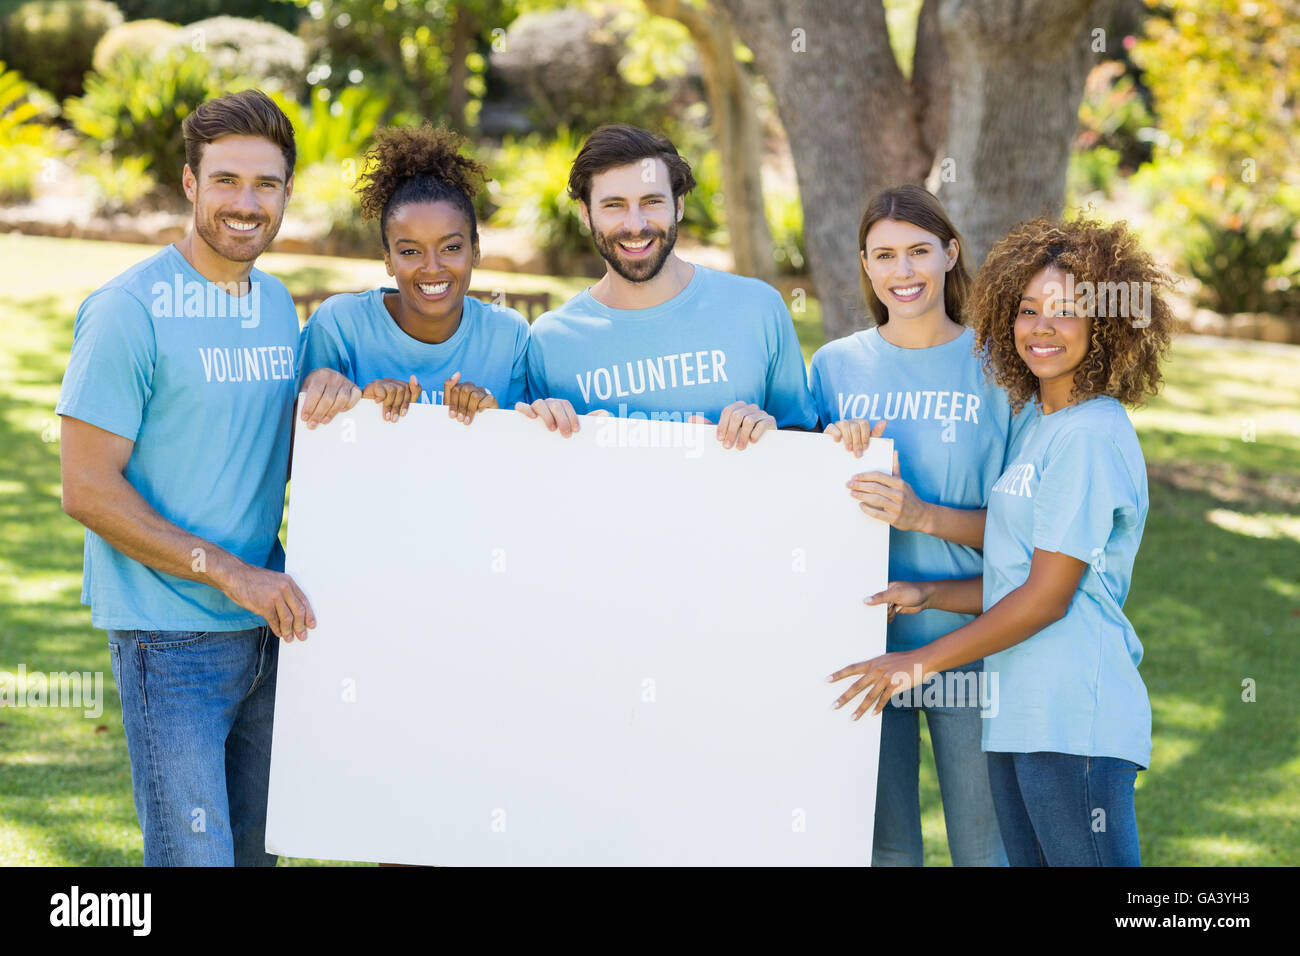 Portrait of volunteer group holding blank sheet - Stock Image